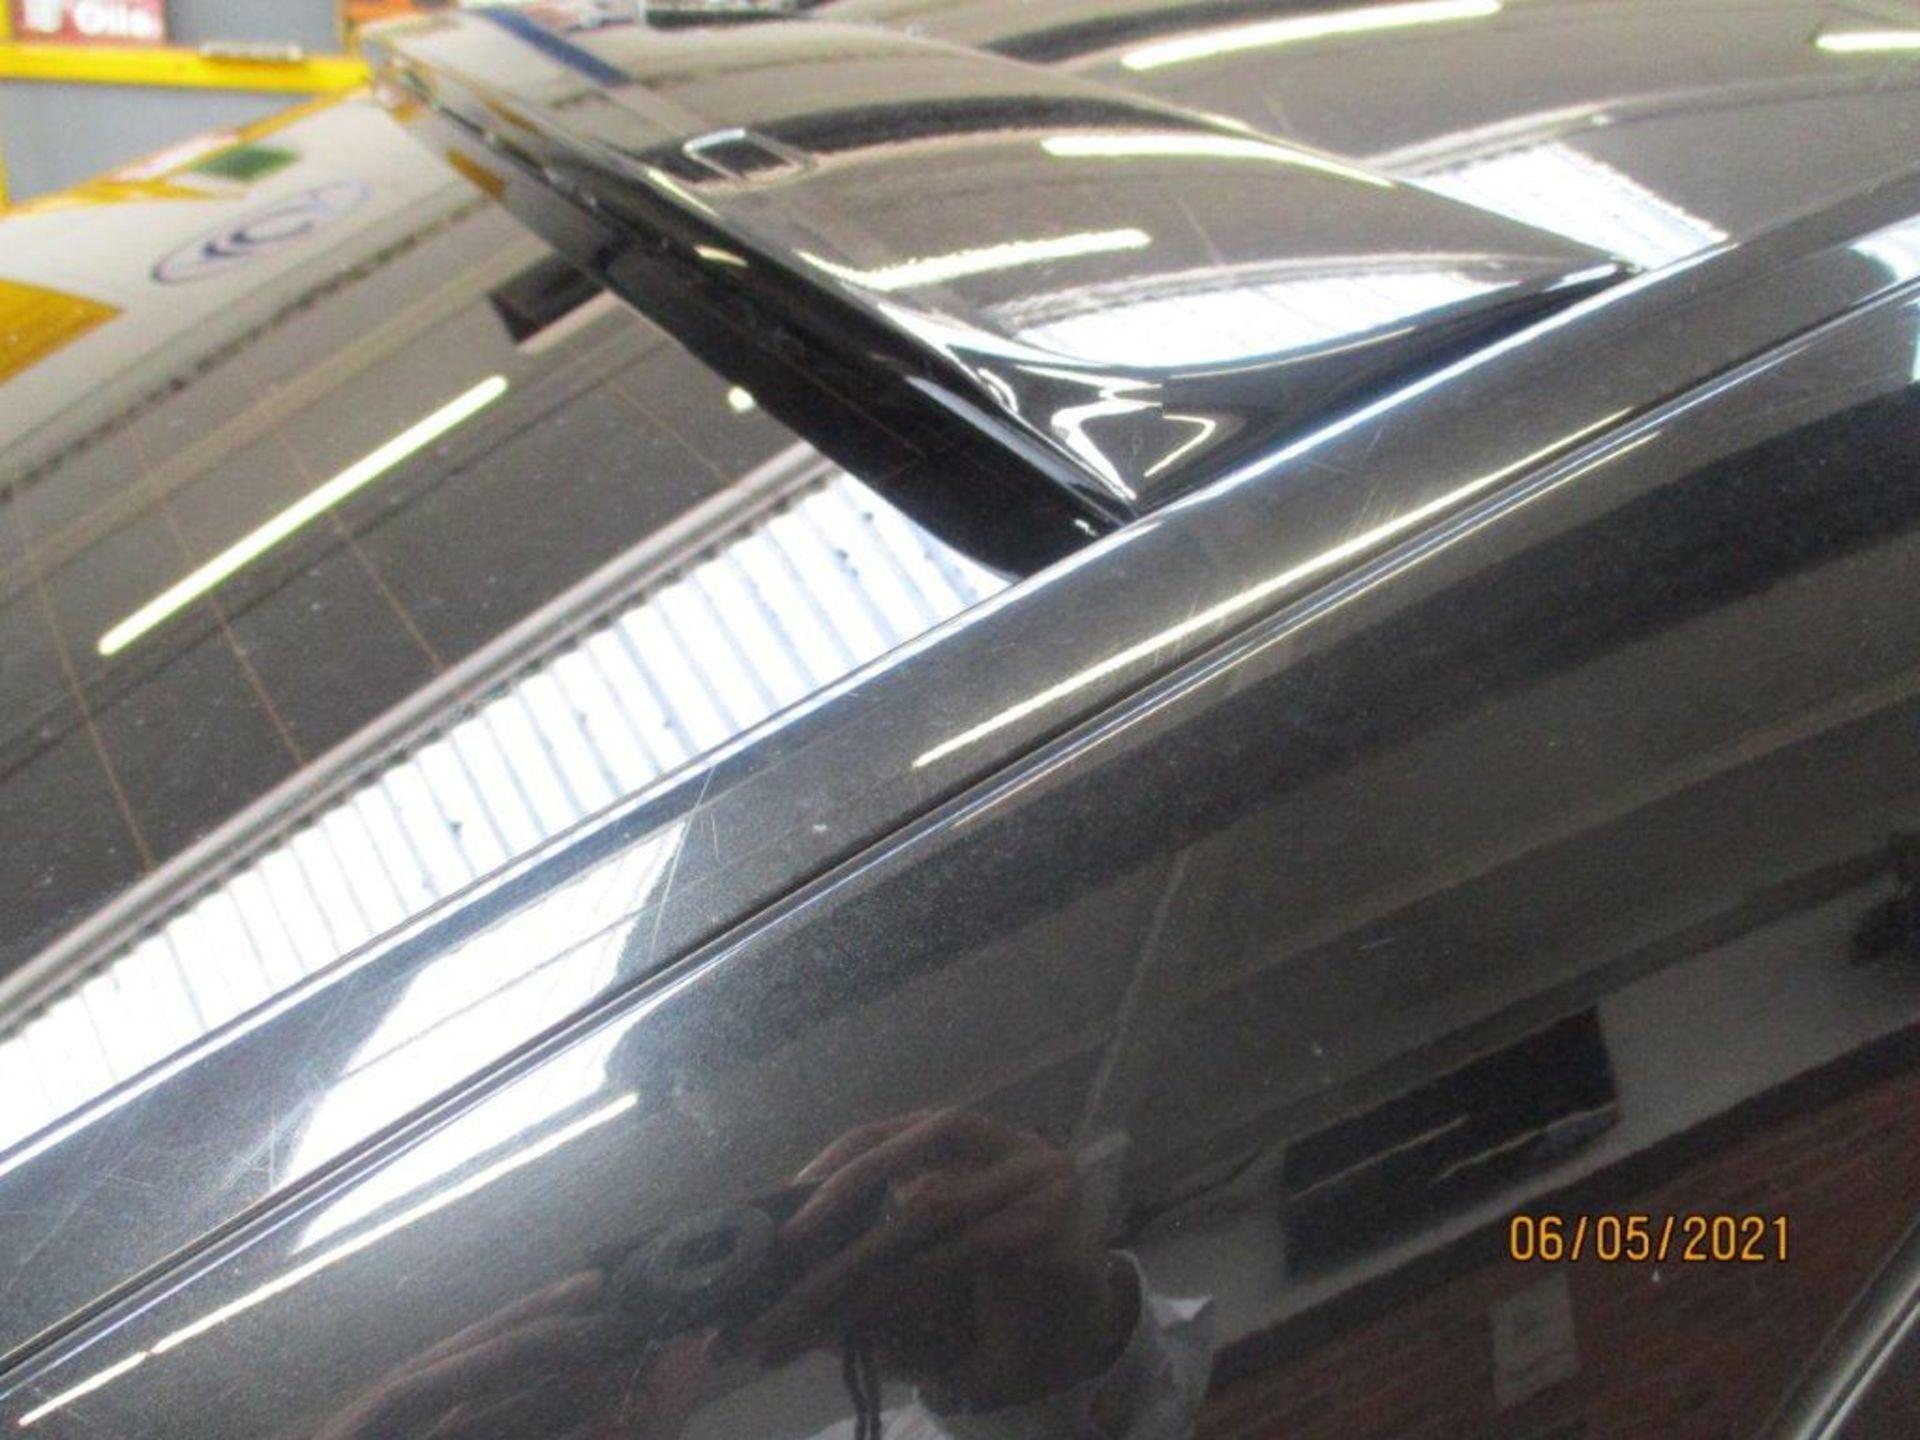 06 06 BMW 730 D Sport Auto - Image 13 of 23